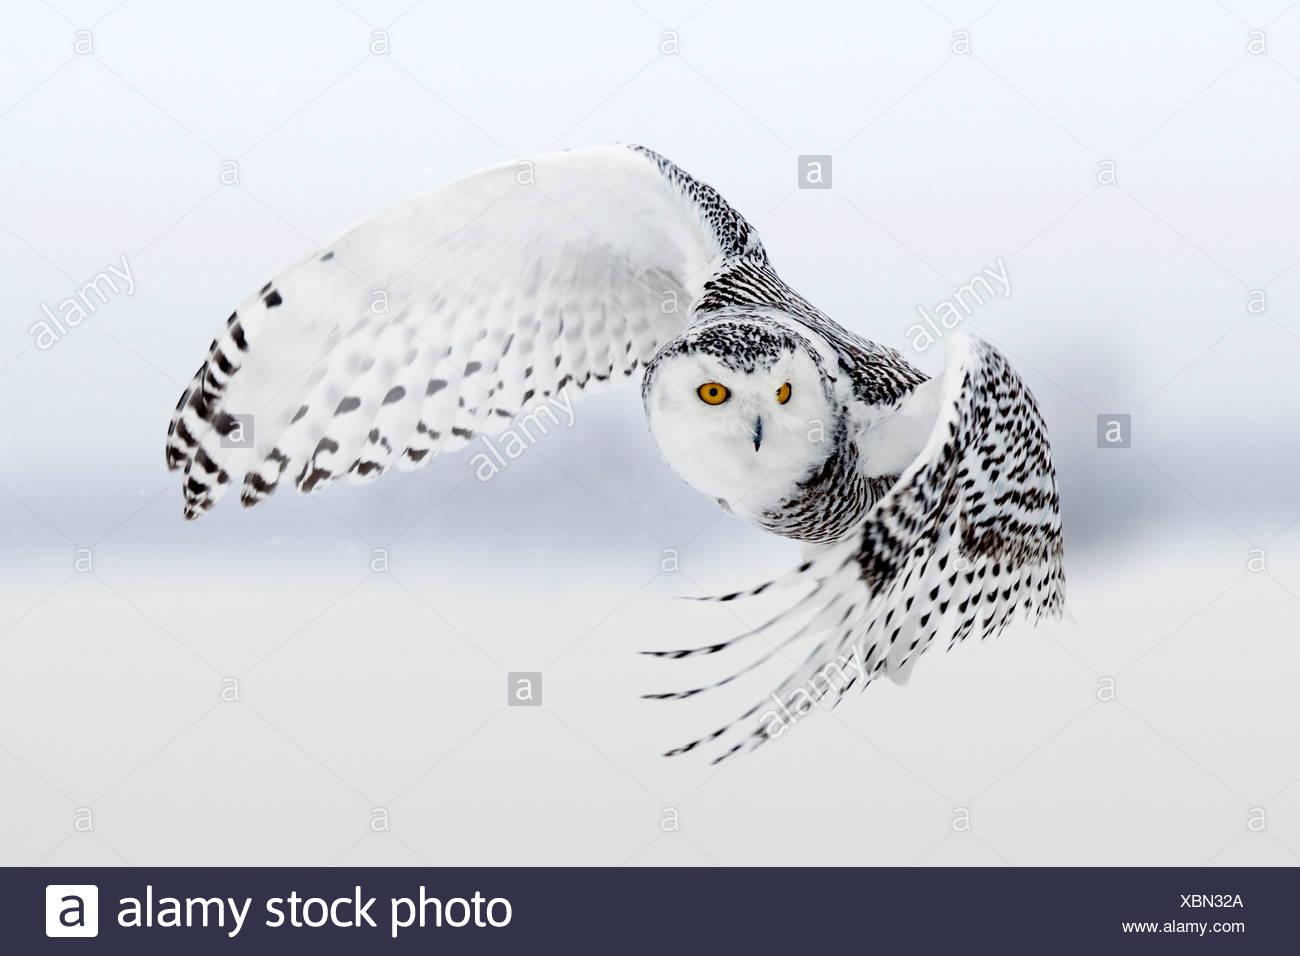 Schneeeule im Flug, Ottawa, Kanada Stockbild